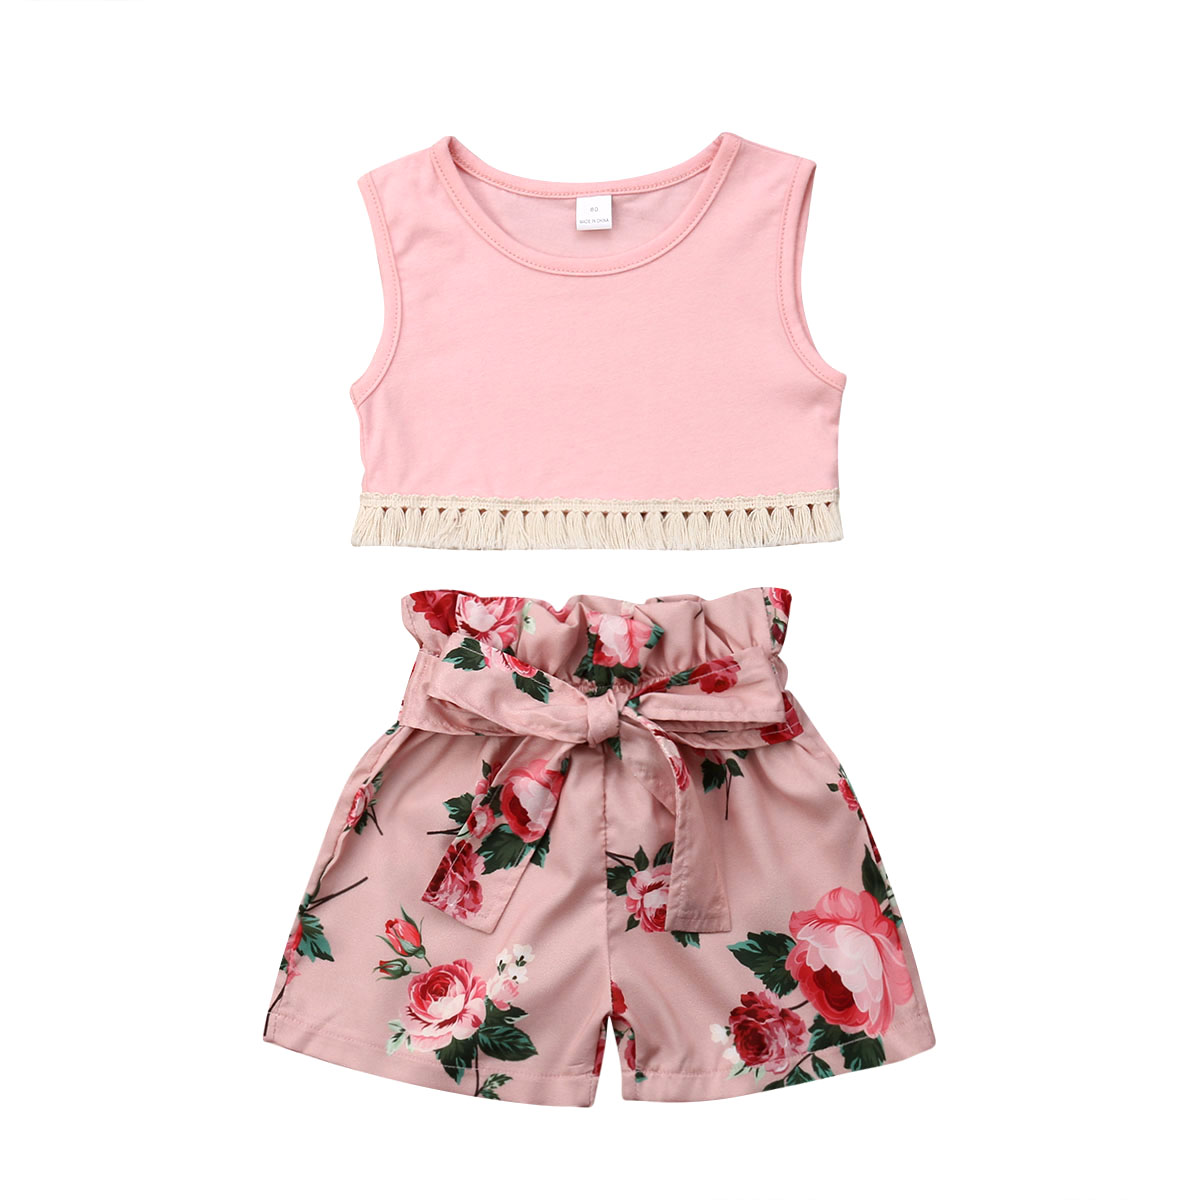 Toddler Baby Girls Shorts Set Sleeveless Shirts Top and Floral Shorts 2Pcs Summer Clothes Outfits